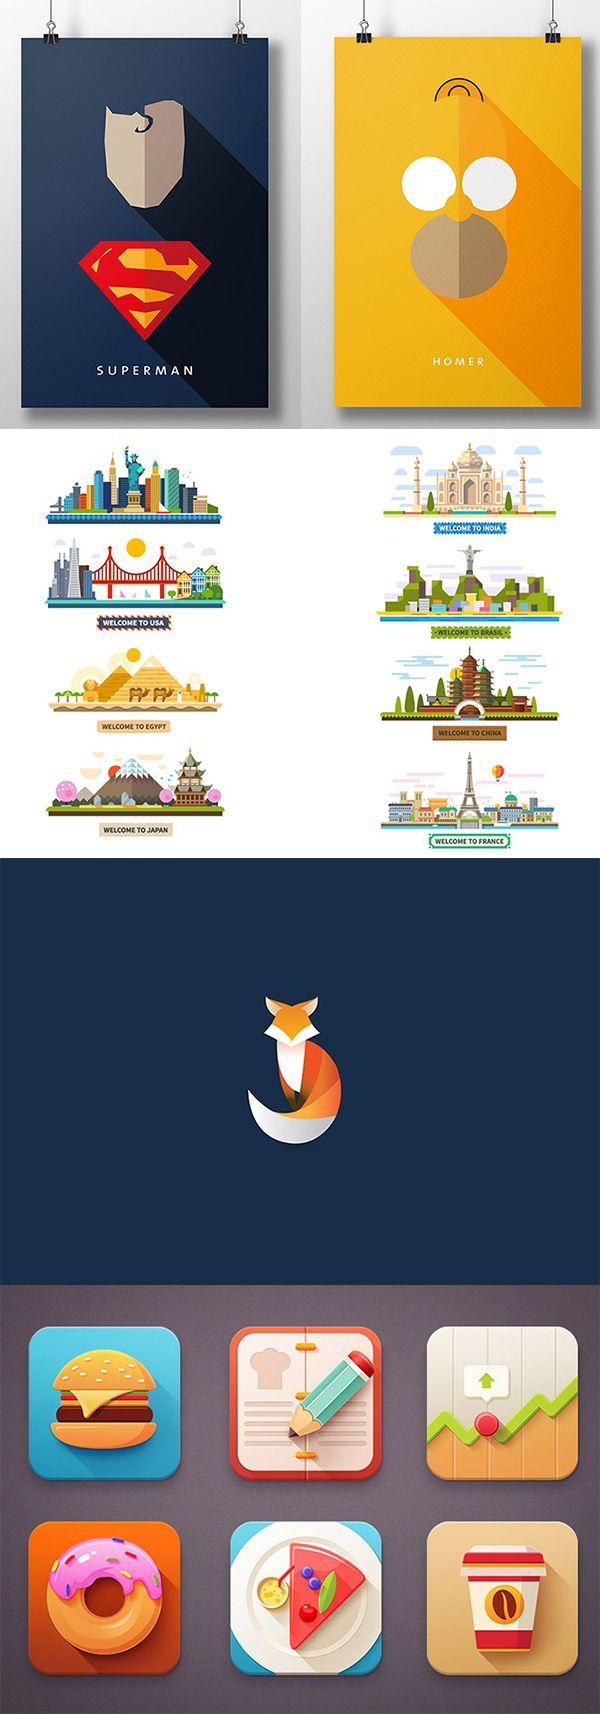 Super Best 25+ Flat design illustration ideas on Pinterest | Flat  JK44